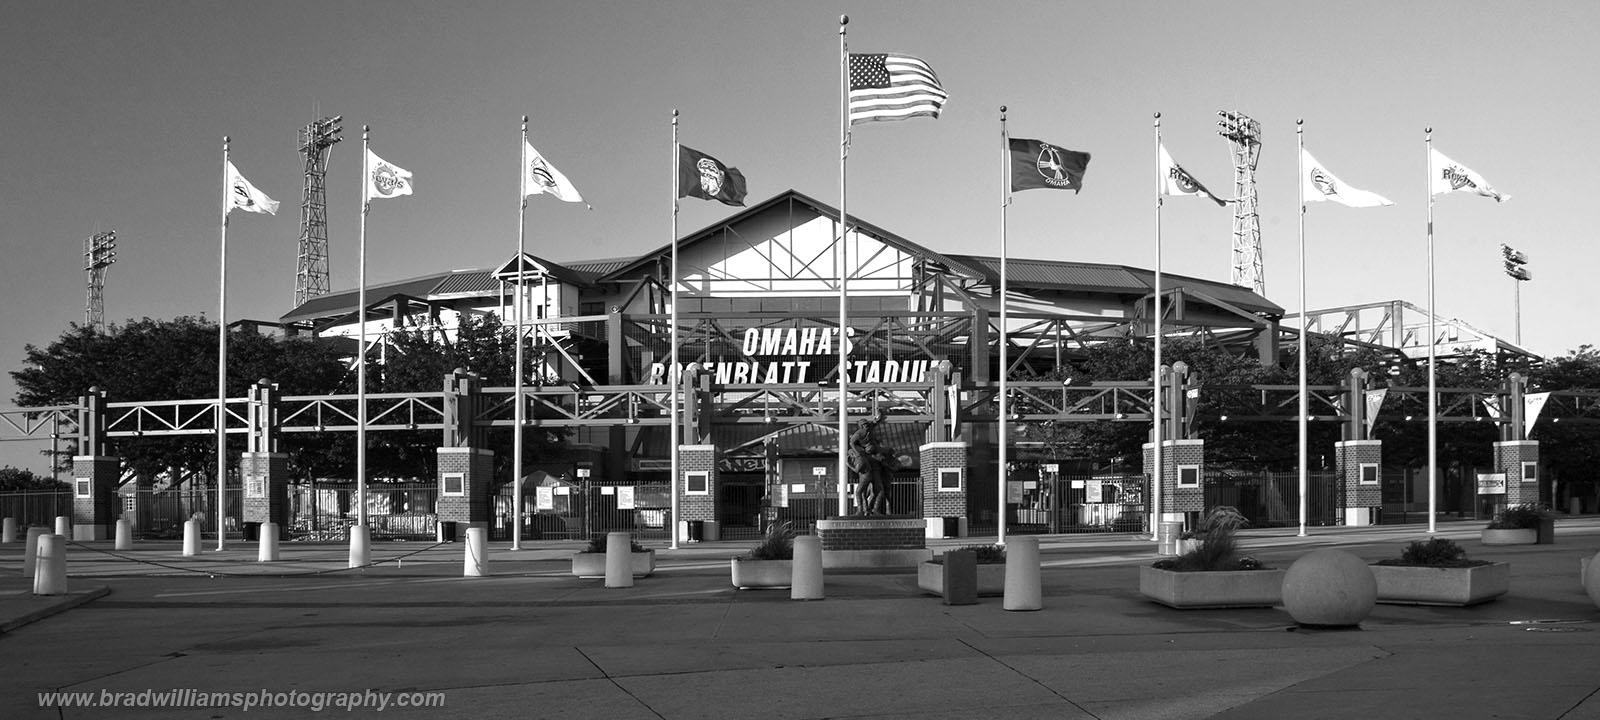 The entrance toRosenblatt Stadium, Omaha, Nebraska